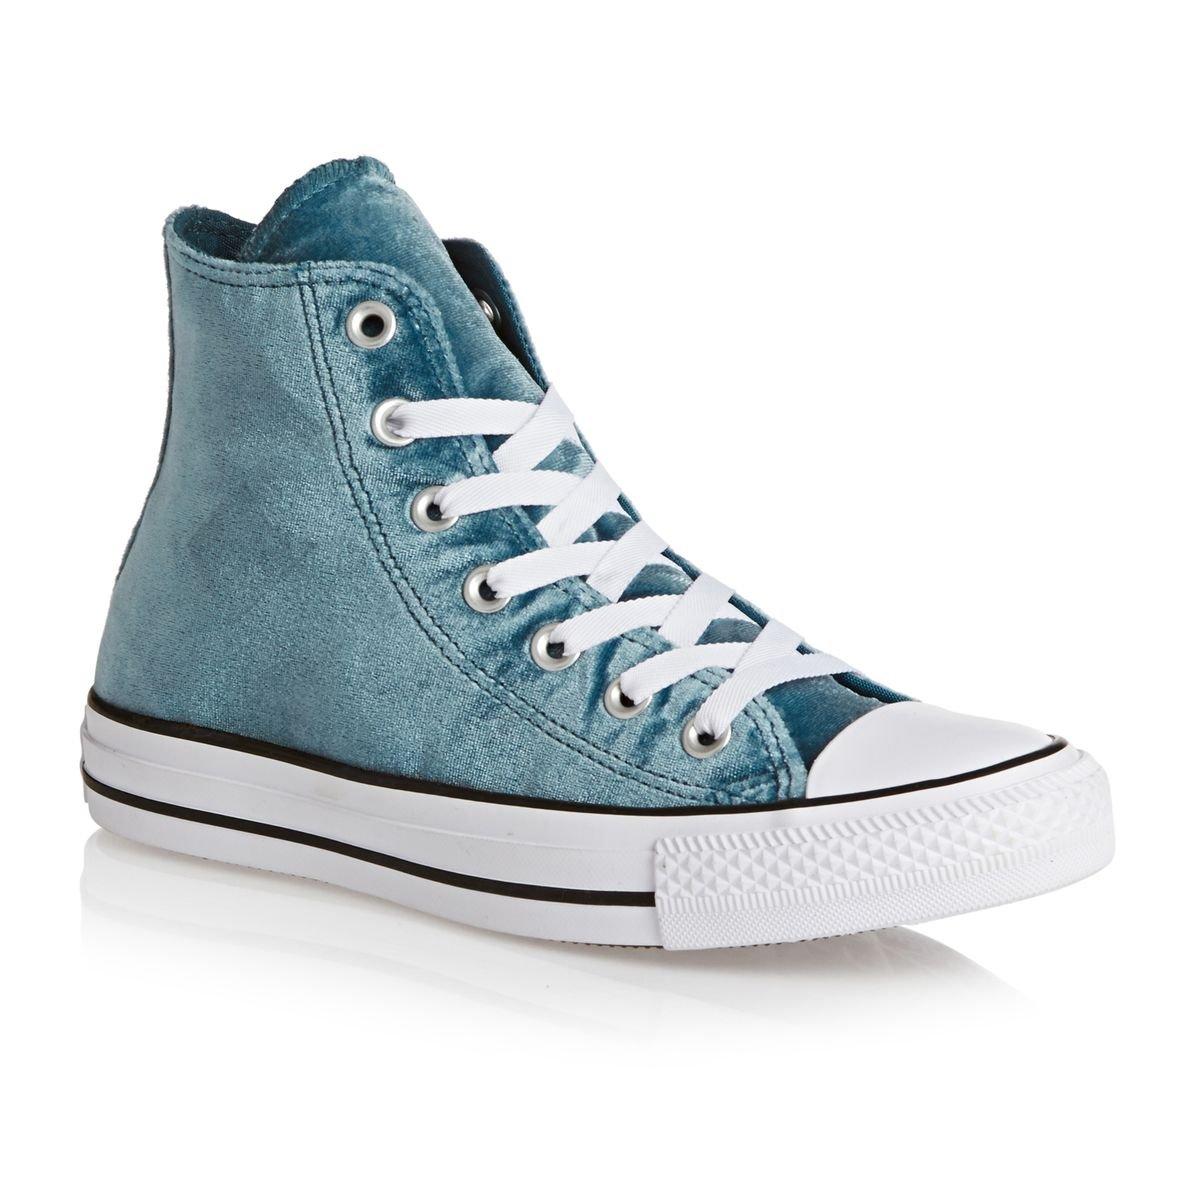 a1eb08d885 Converse Womens Velvet Chuck Taylor All Star Hi-Top Sneakers